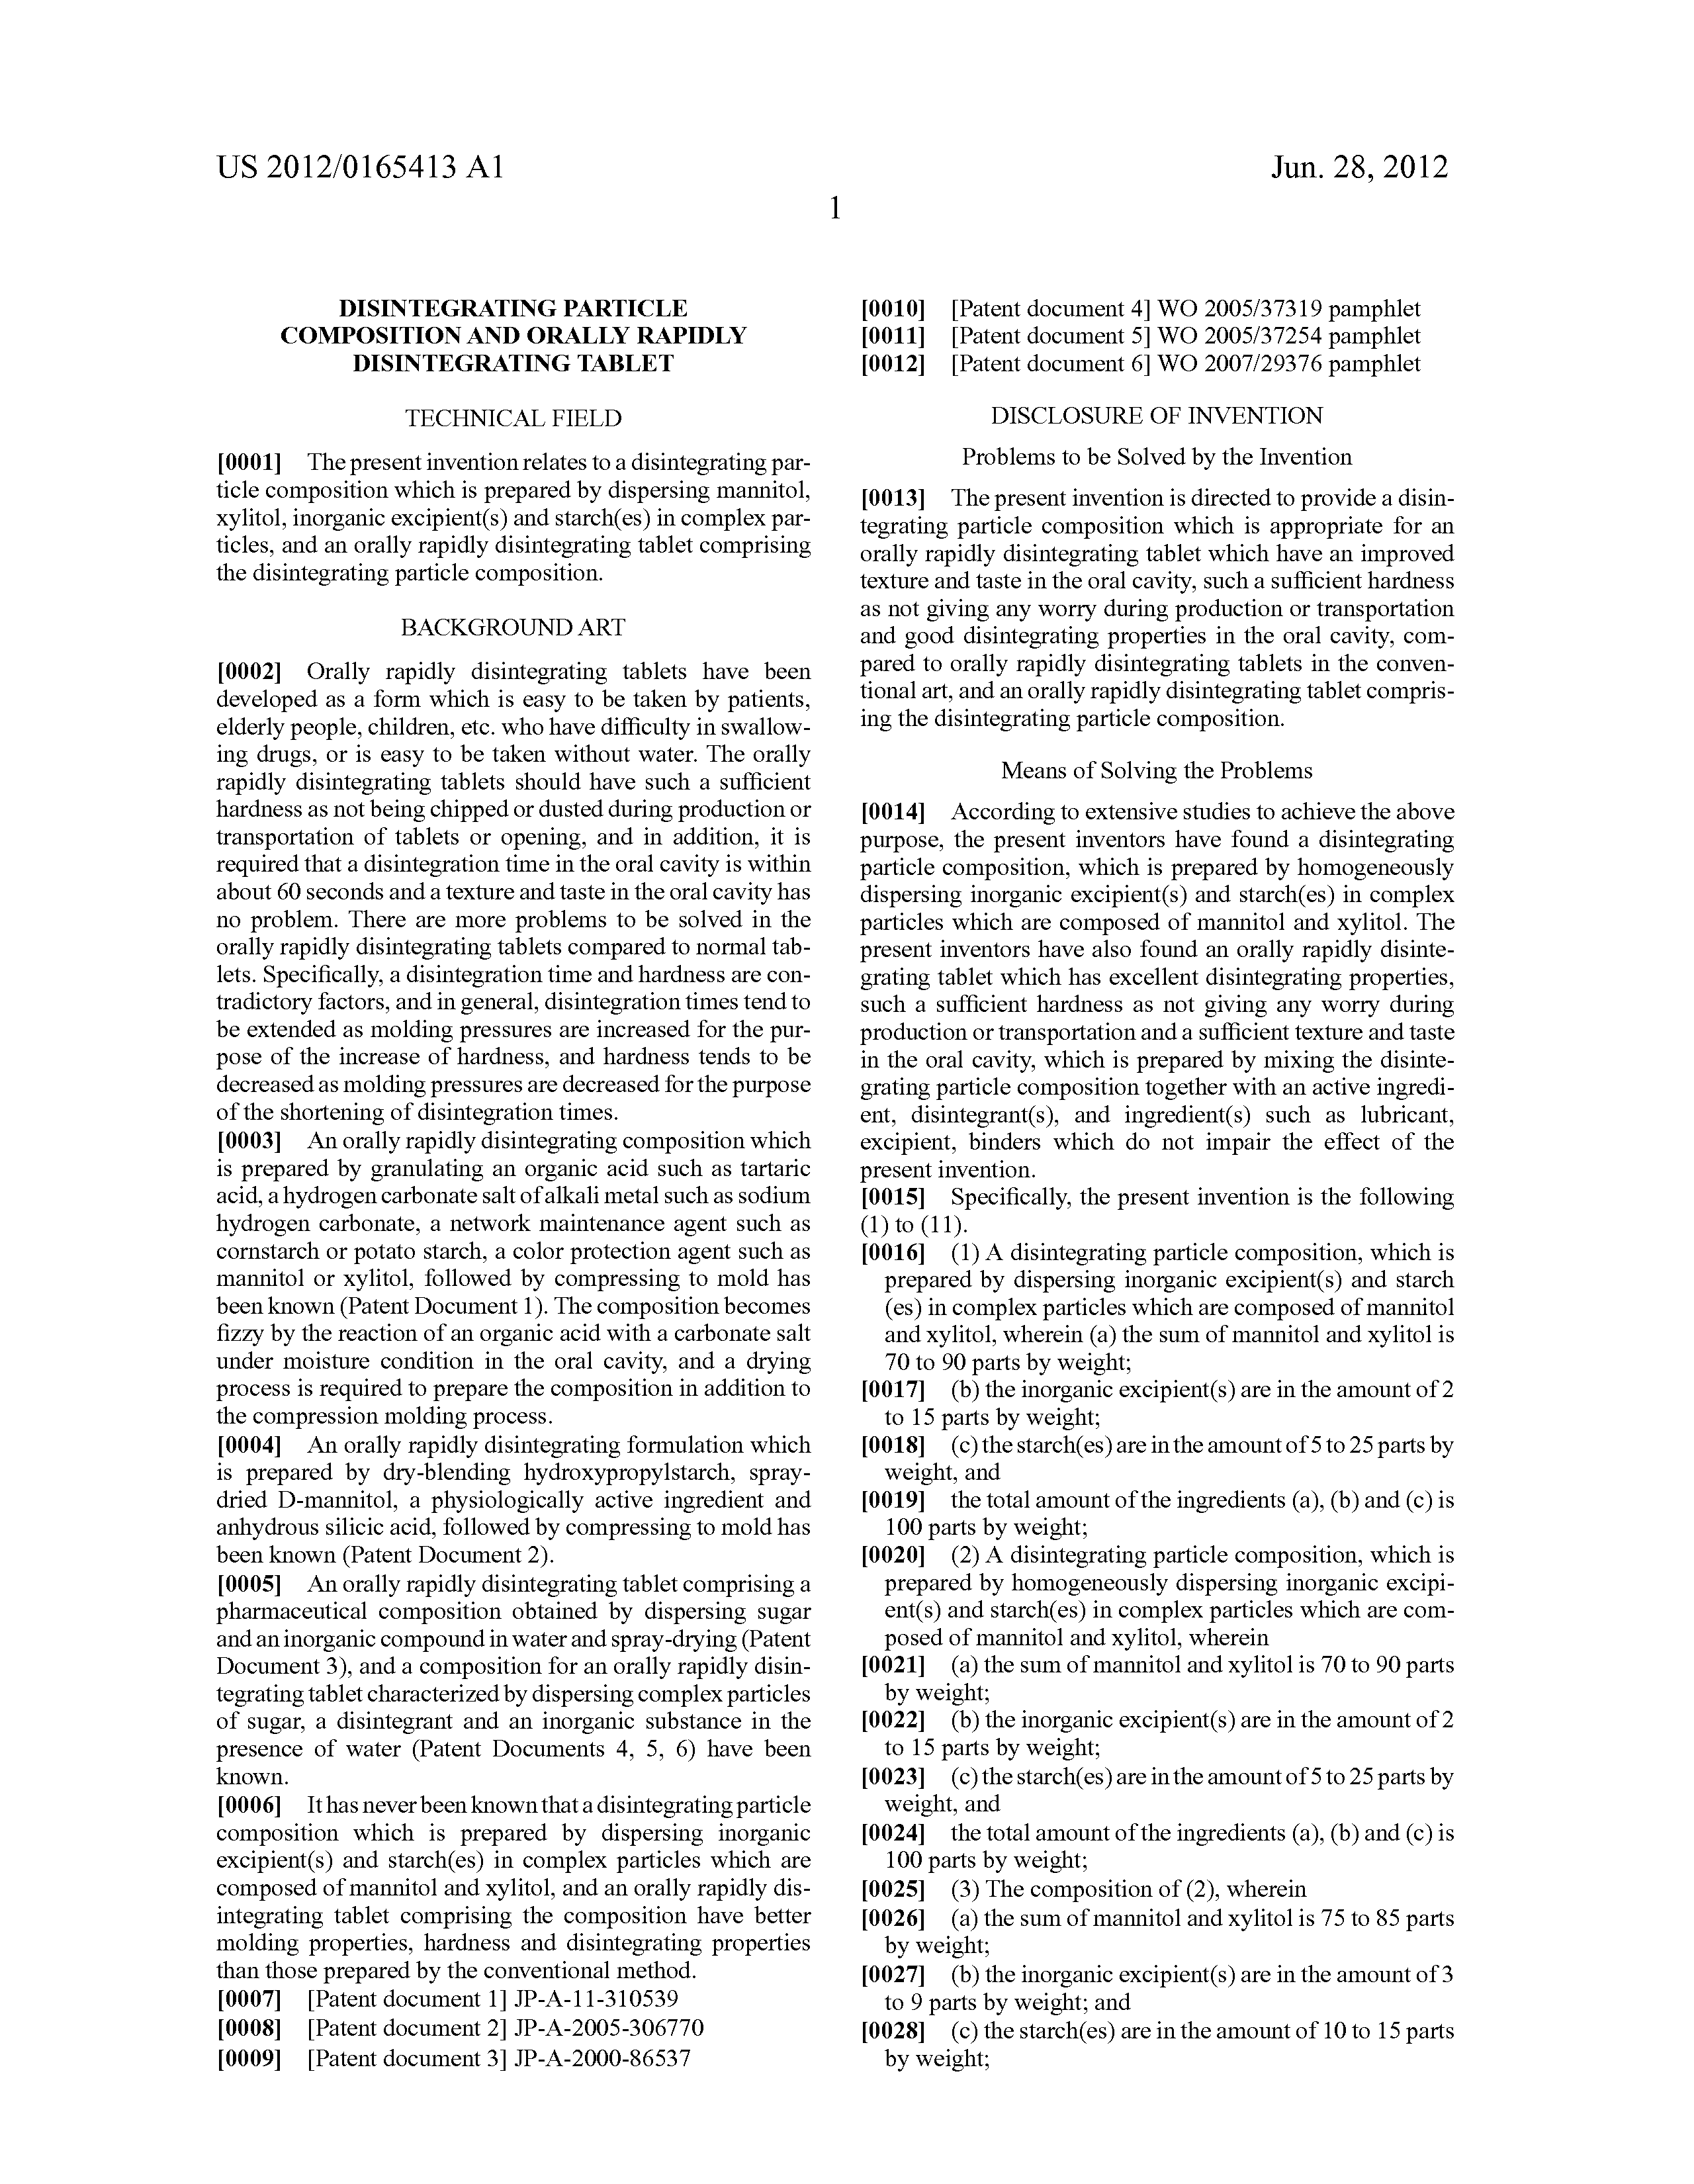 famvir versus valtrex